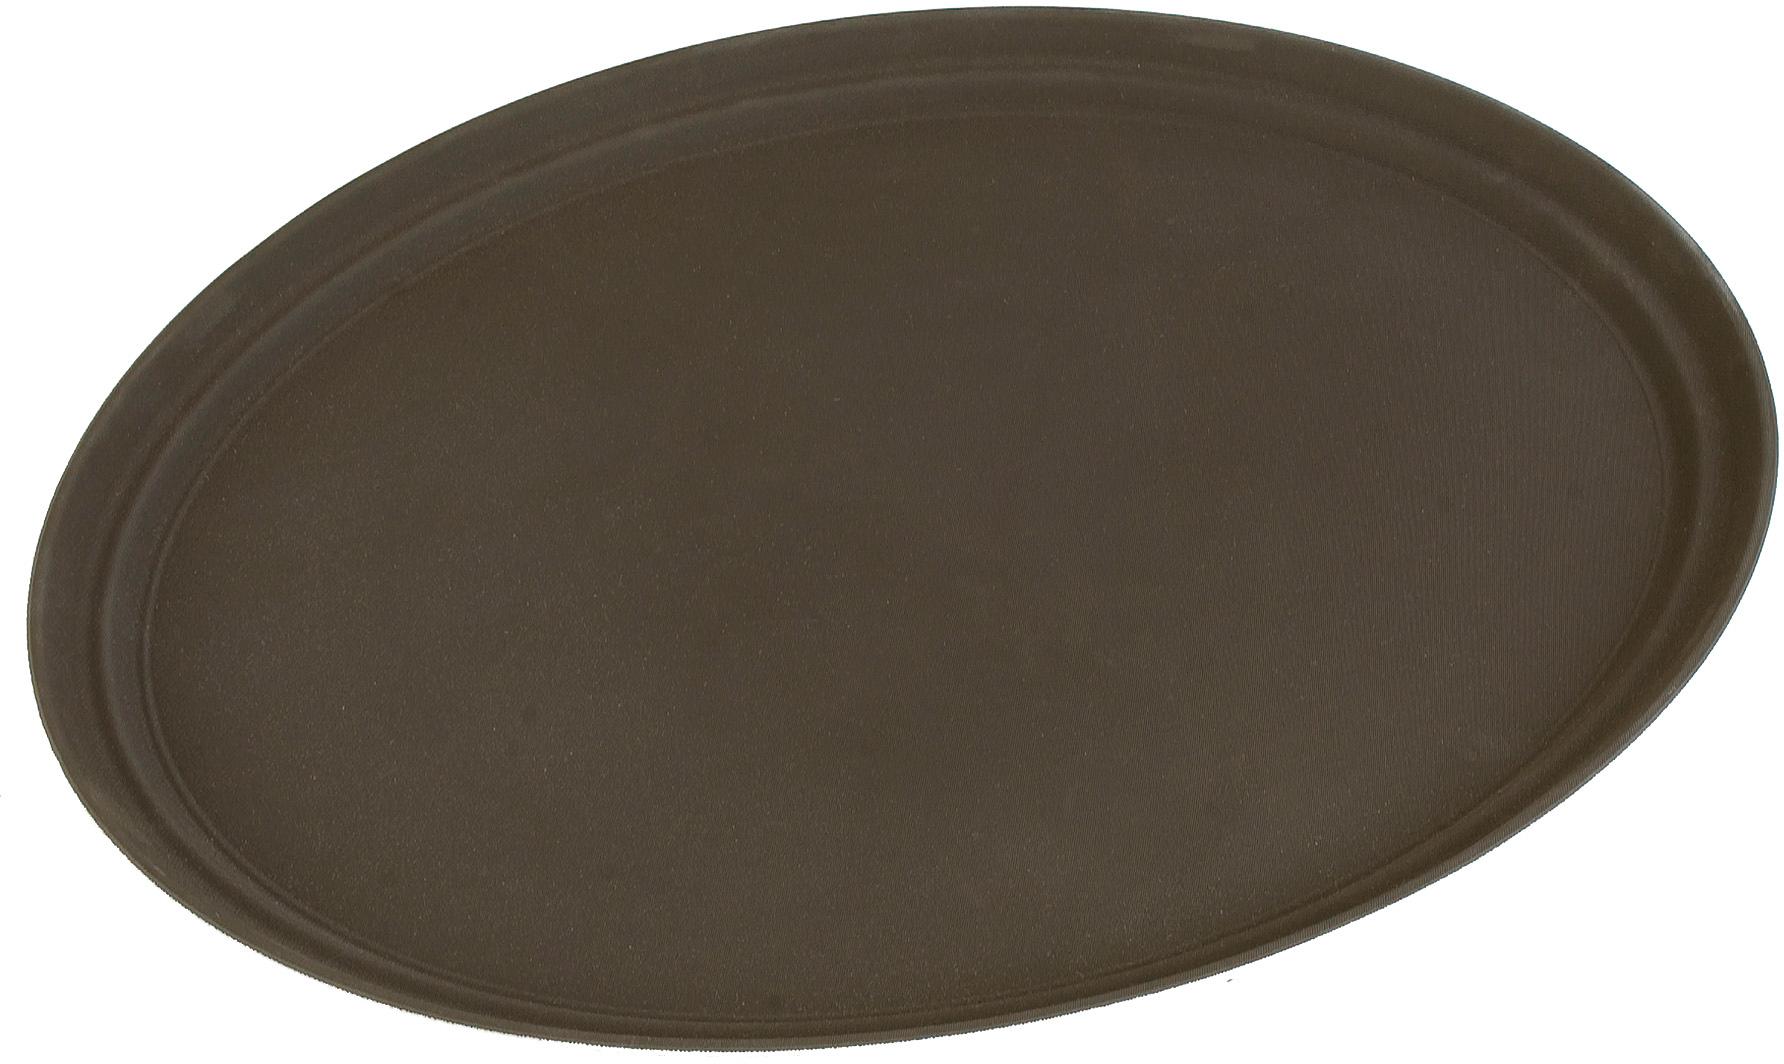 Truebasics Oval Grip Tray 29 x 23.5 - Toffee Tan